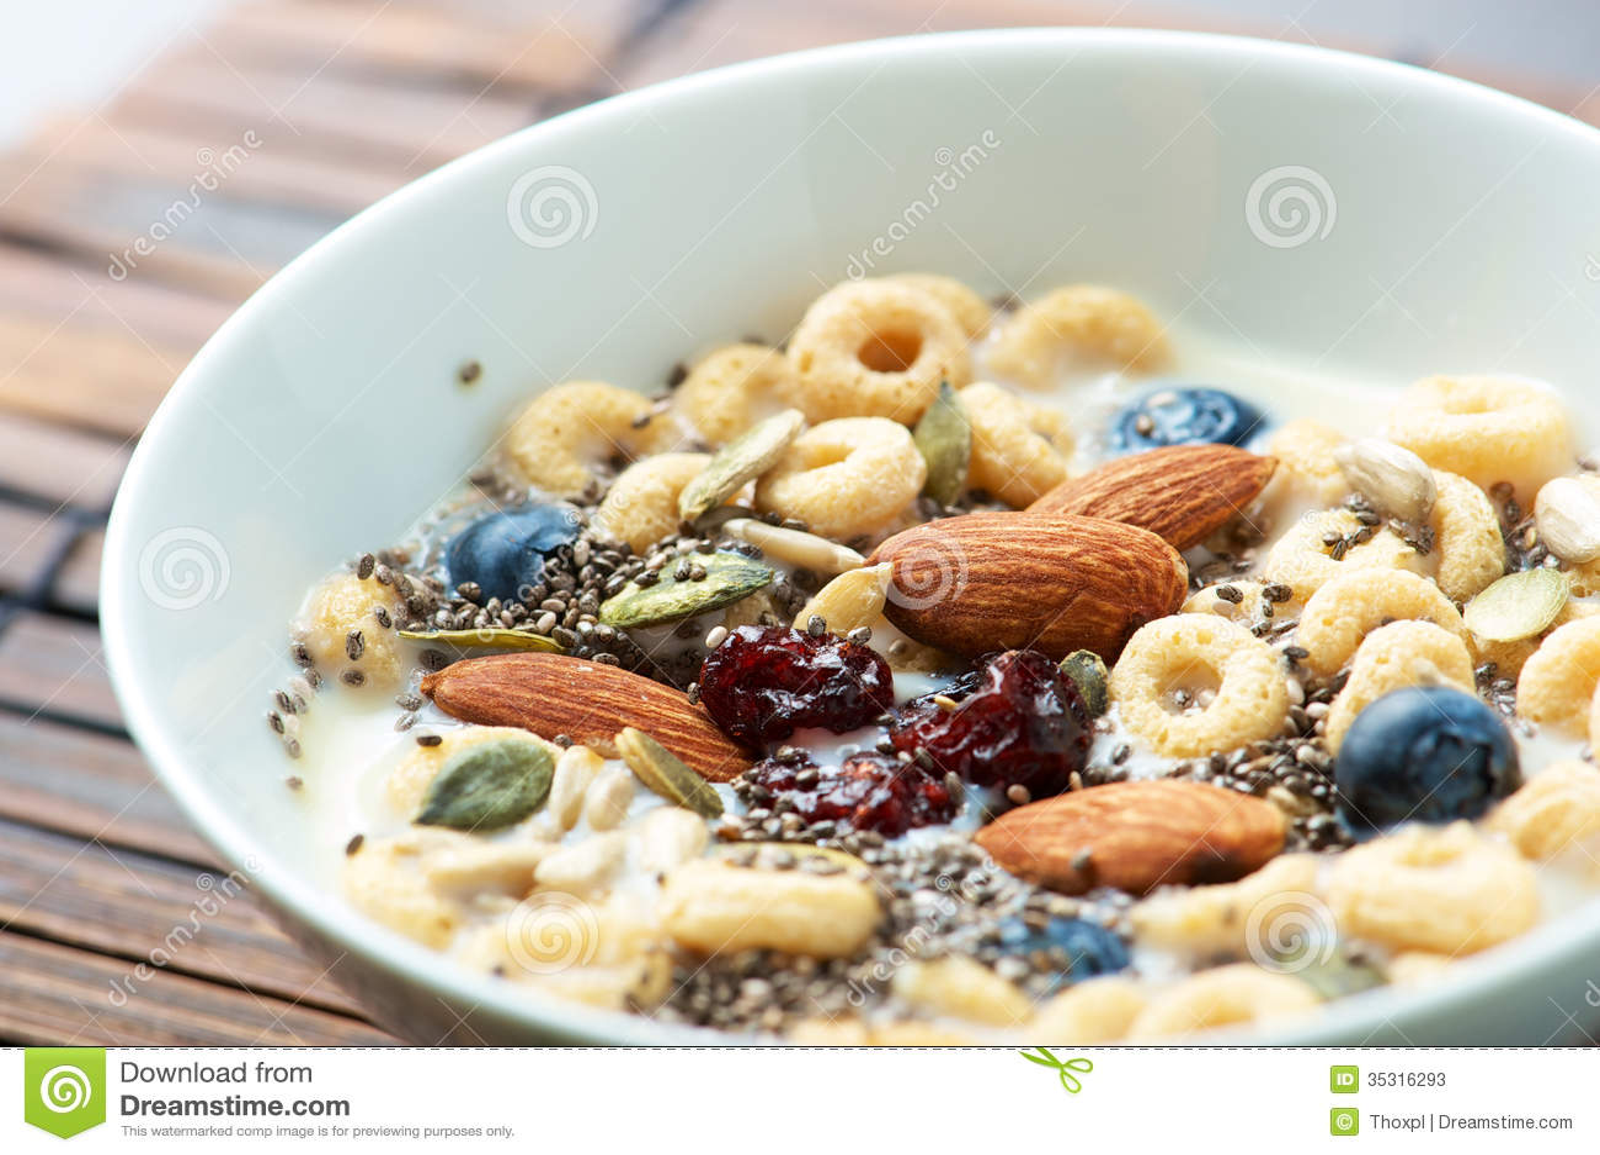 Chia foods